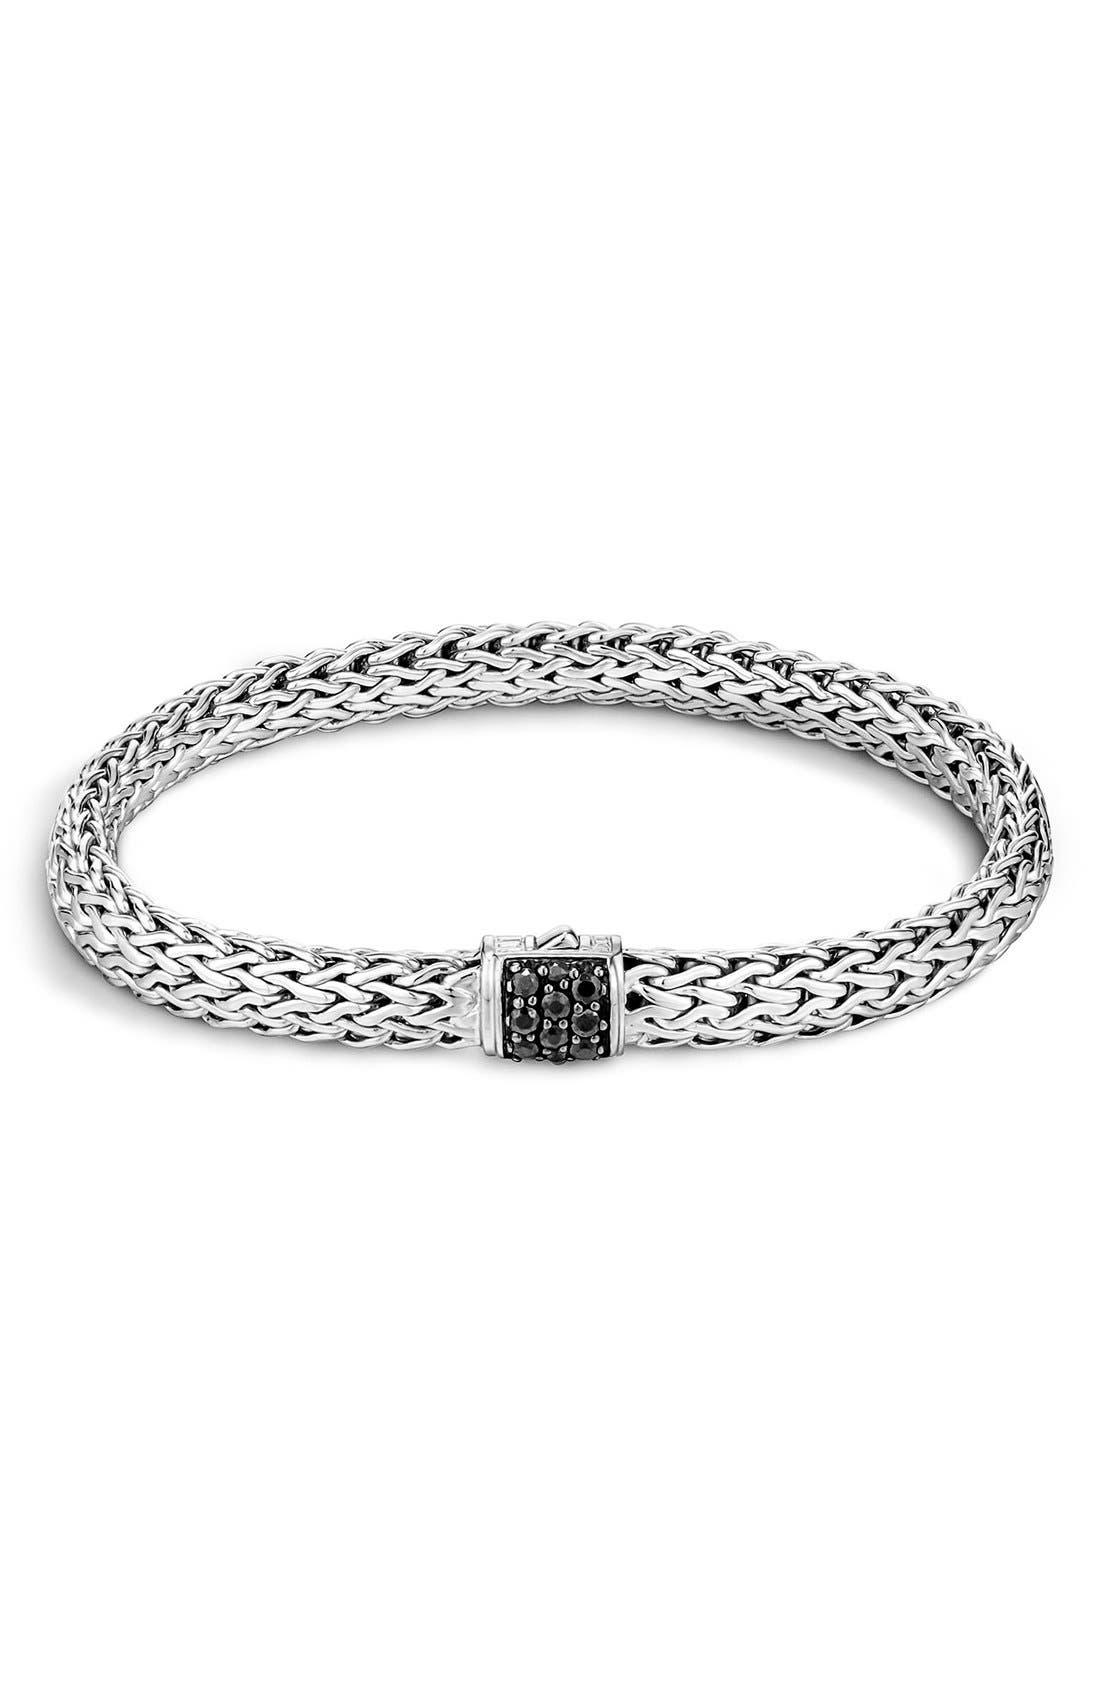 Main Image - John Hardy Classic Chain 6.5mm Bracelet